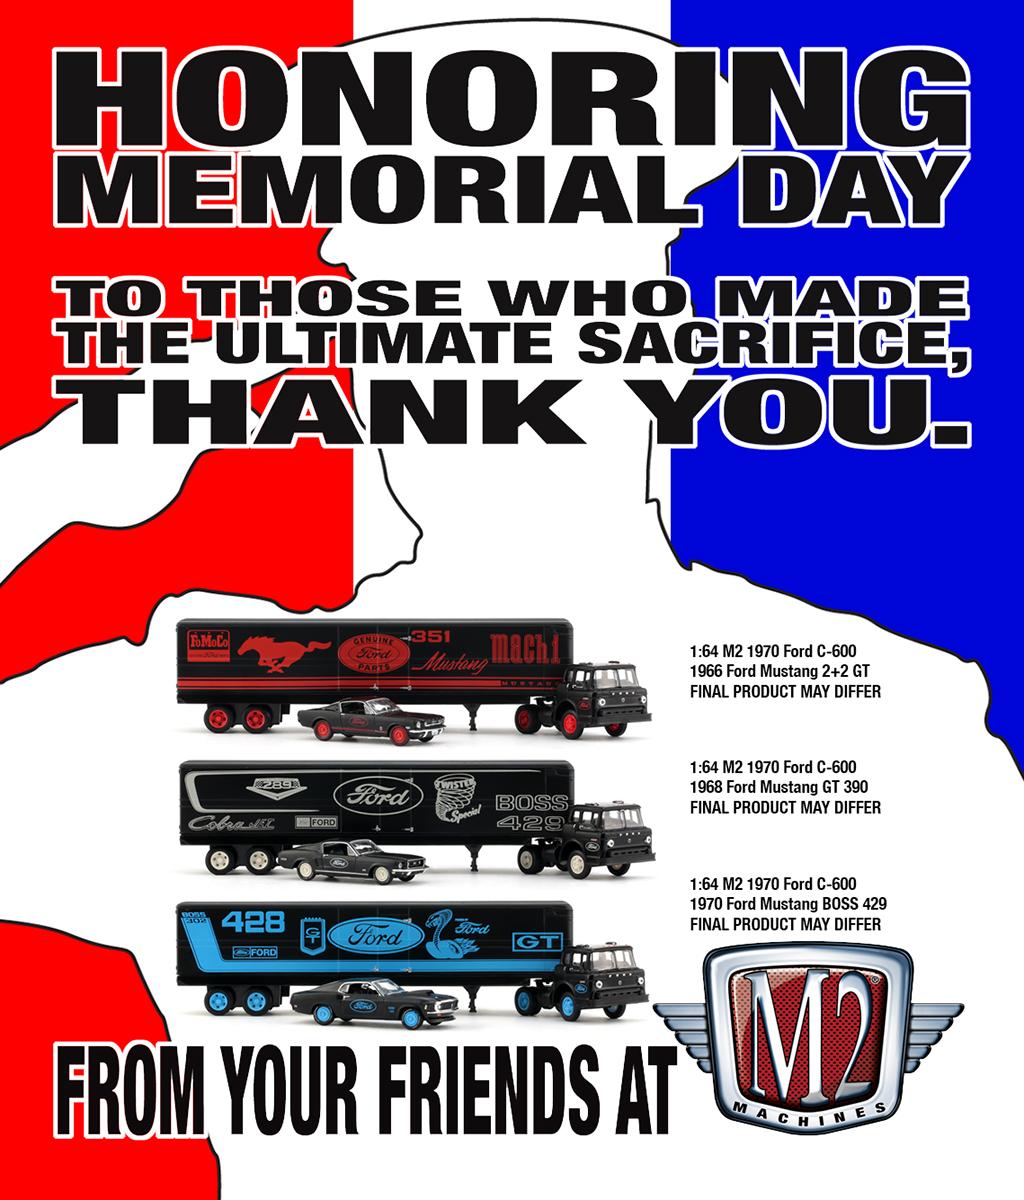 7526d660c0725  m2  m2machines  memorialday  sneakpeek  comingsoon  ford  mustang  truck   trailer  semi  fastback  fomoco  351  mach1  gt  390  289  cobrajet   BOSS429 ...